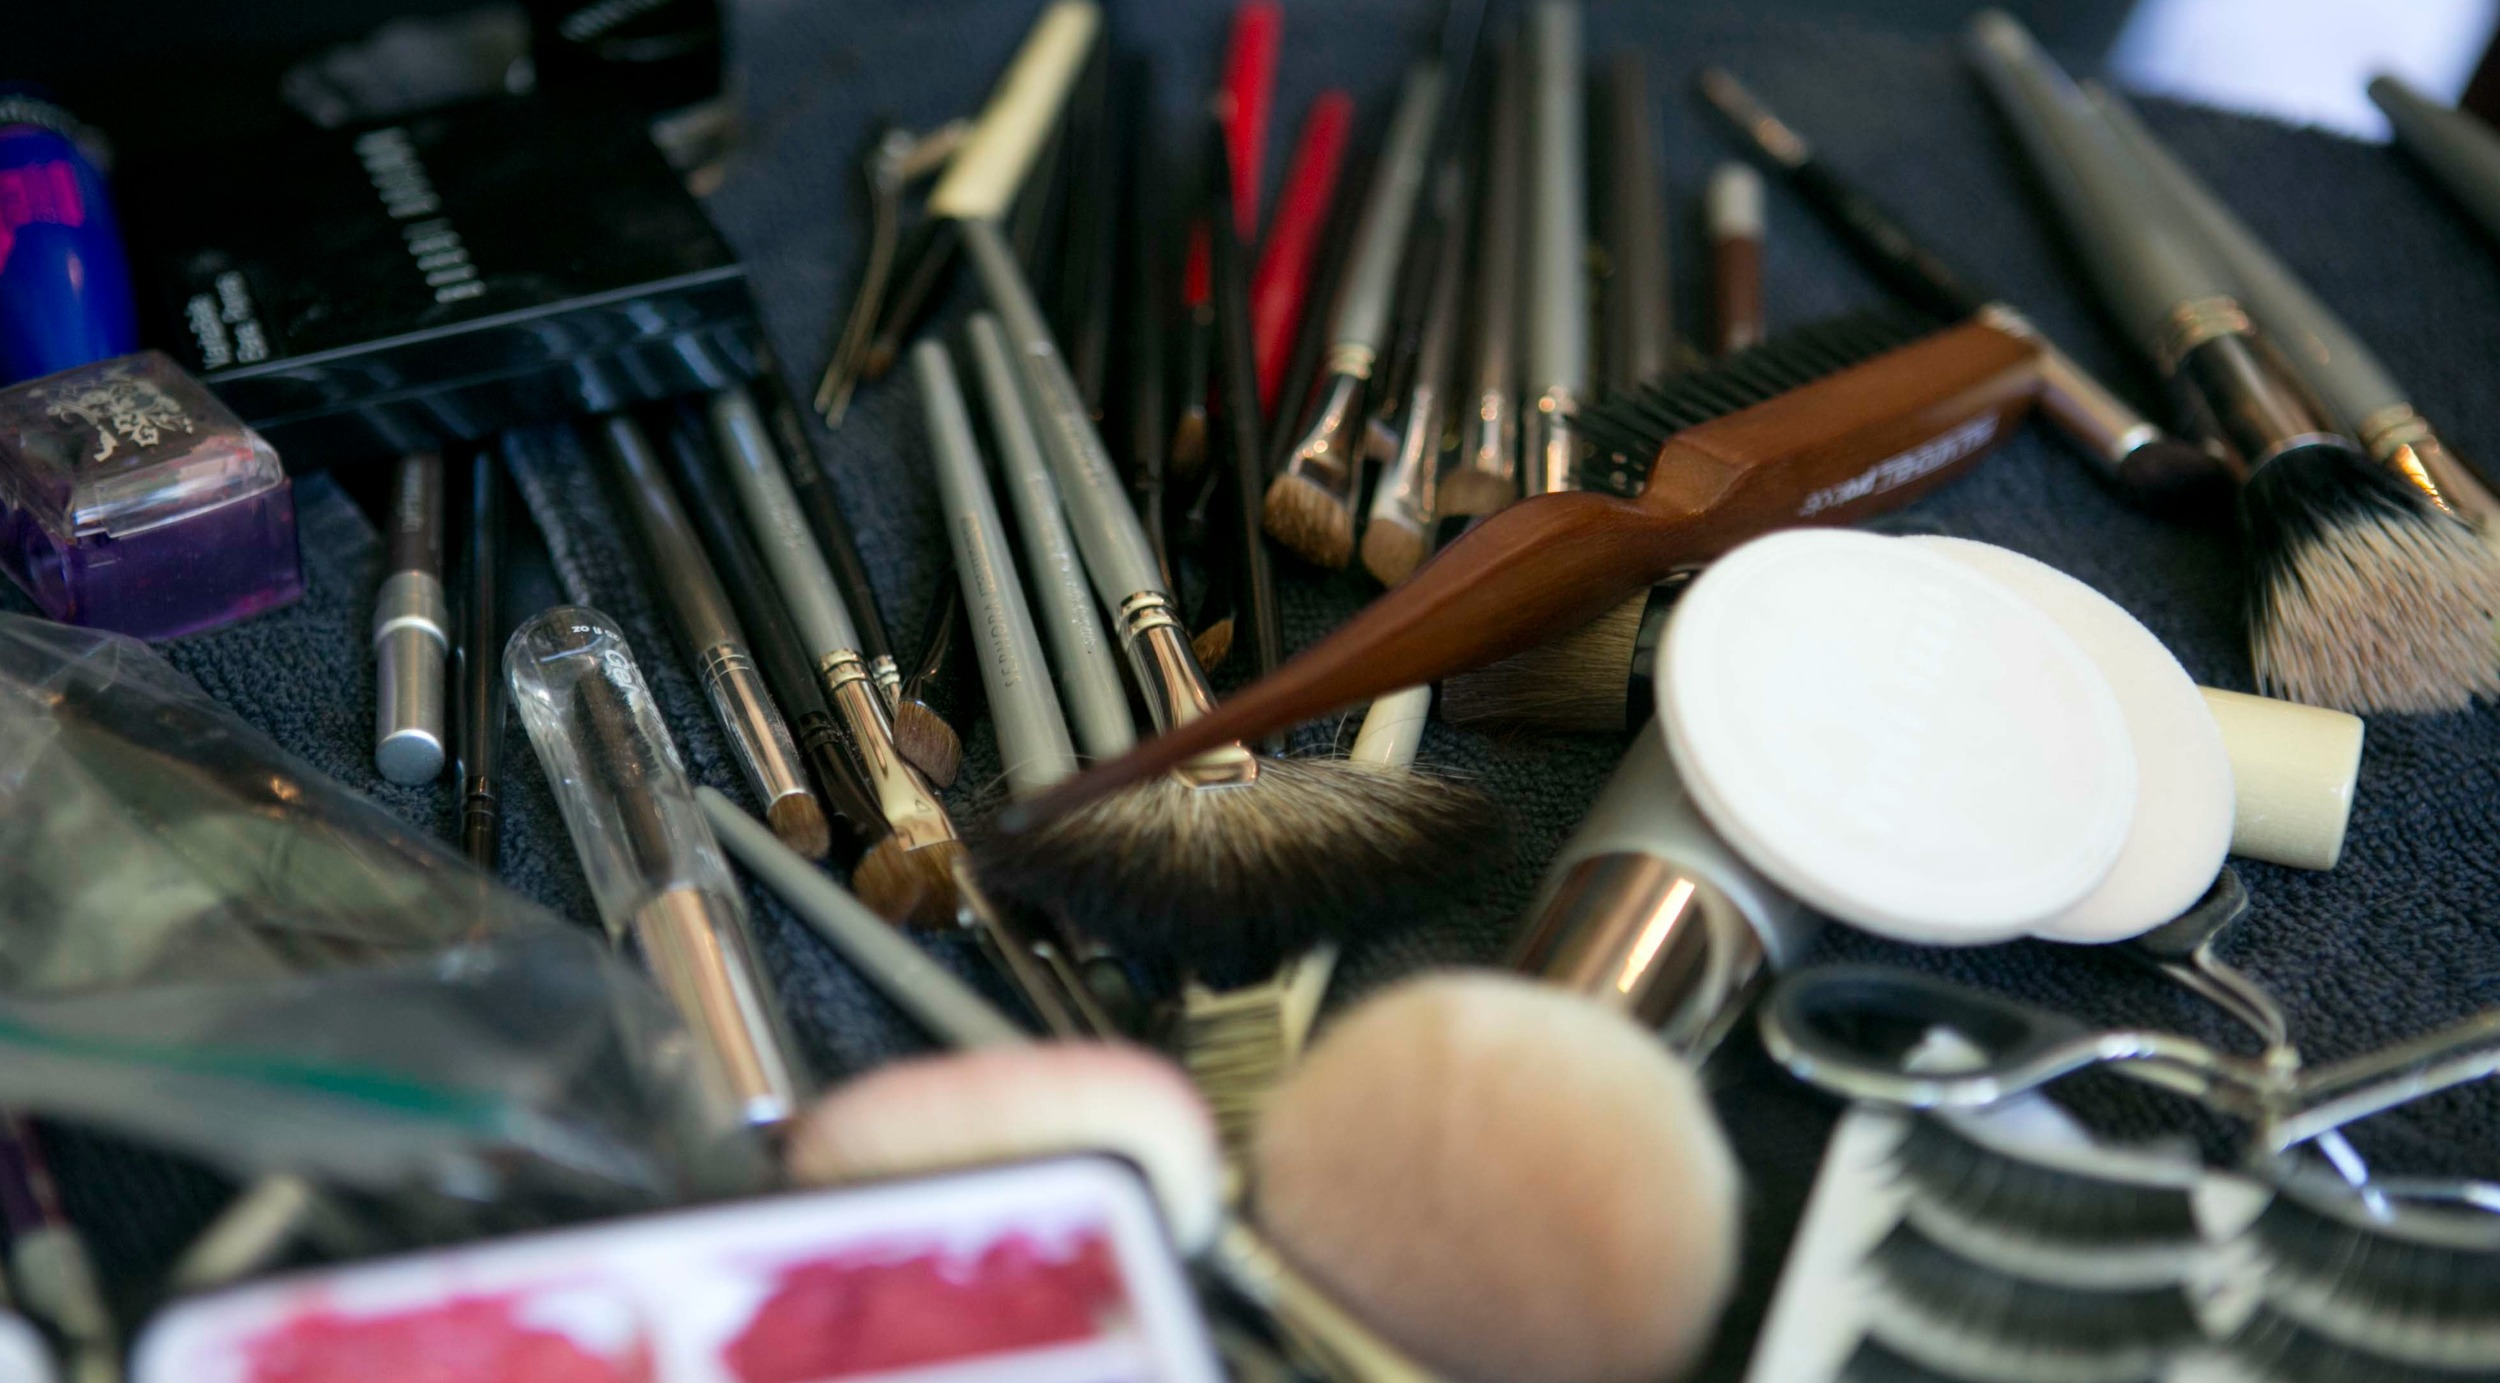 makeup brushes.jpg